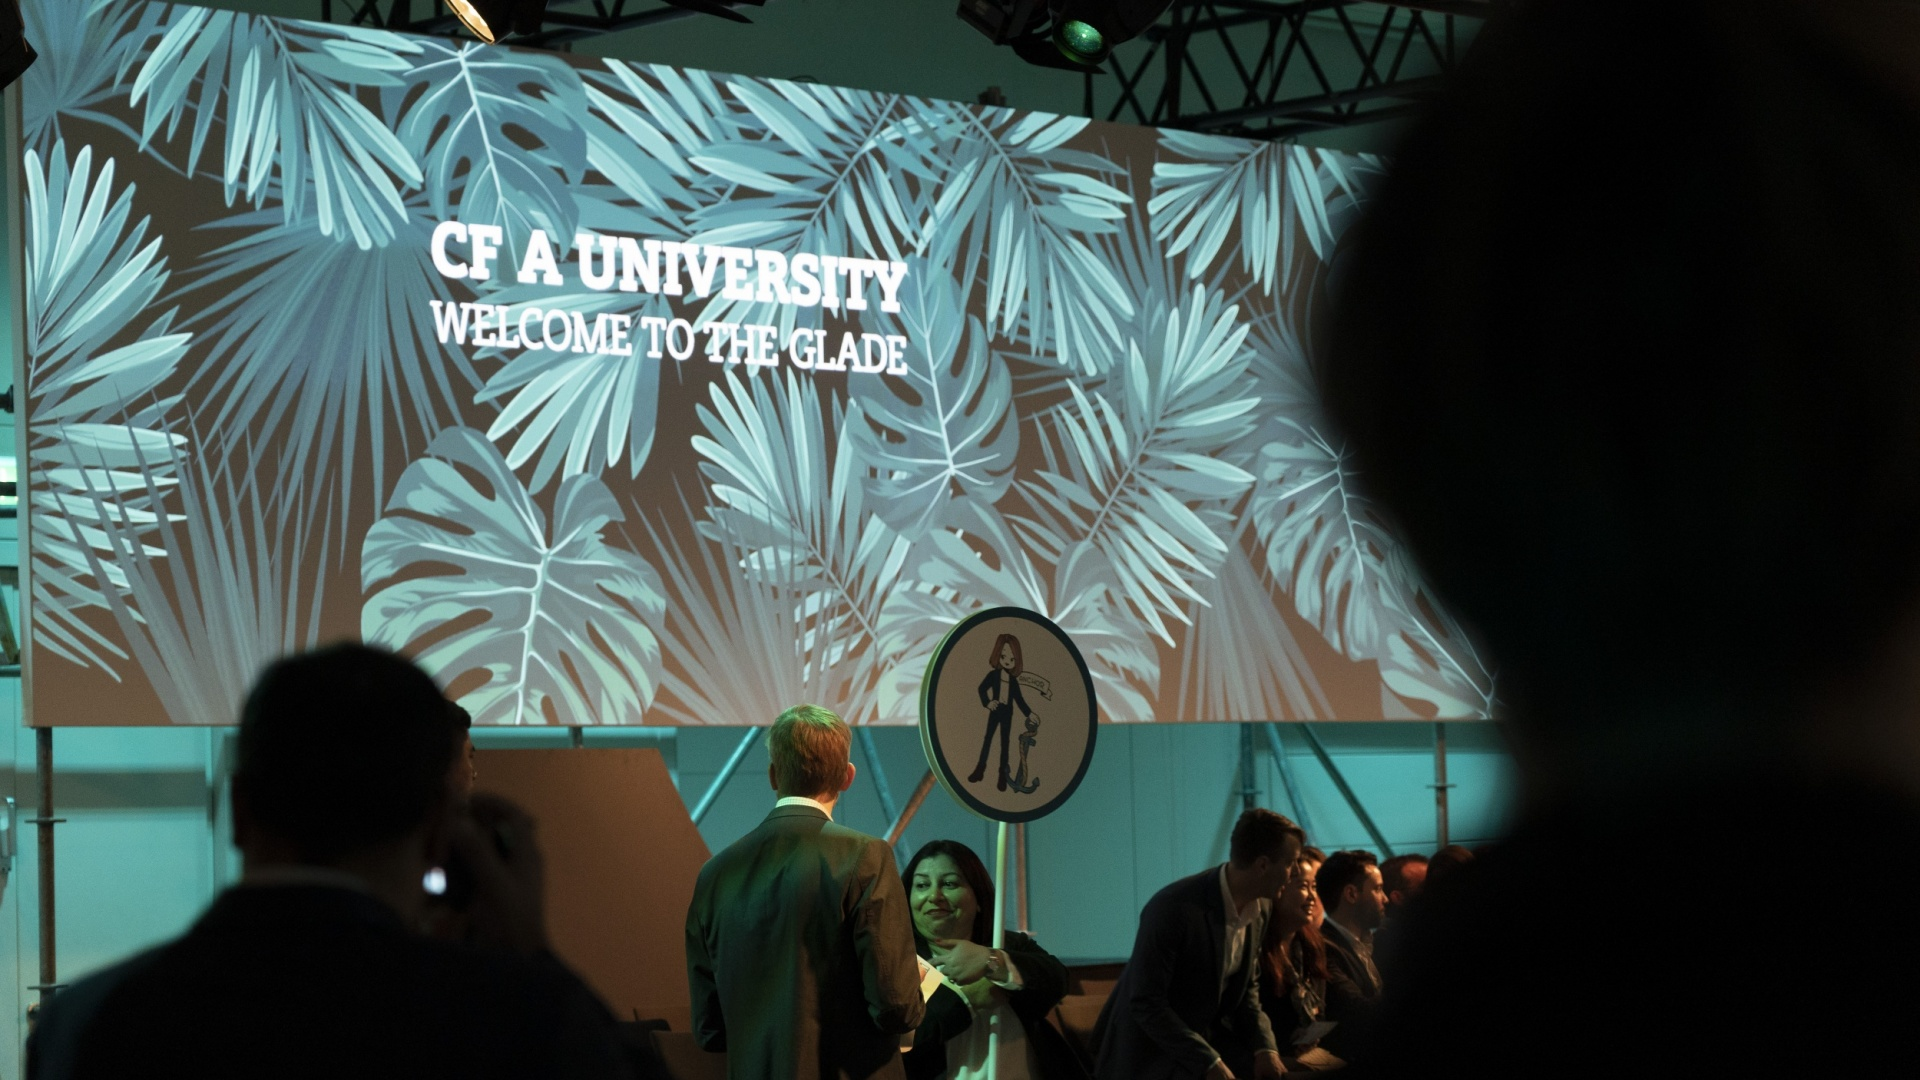 CF A University